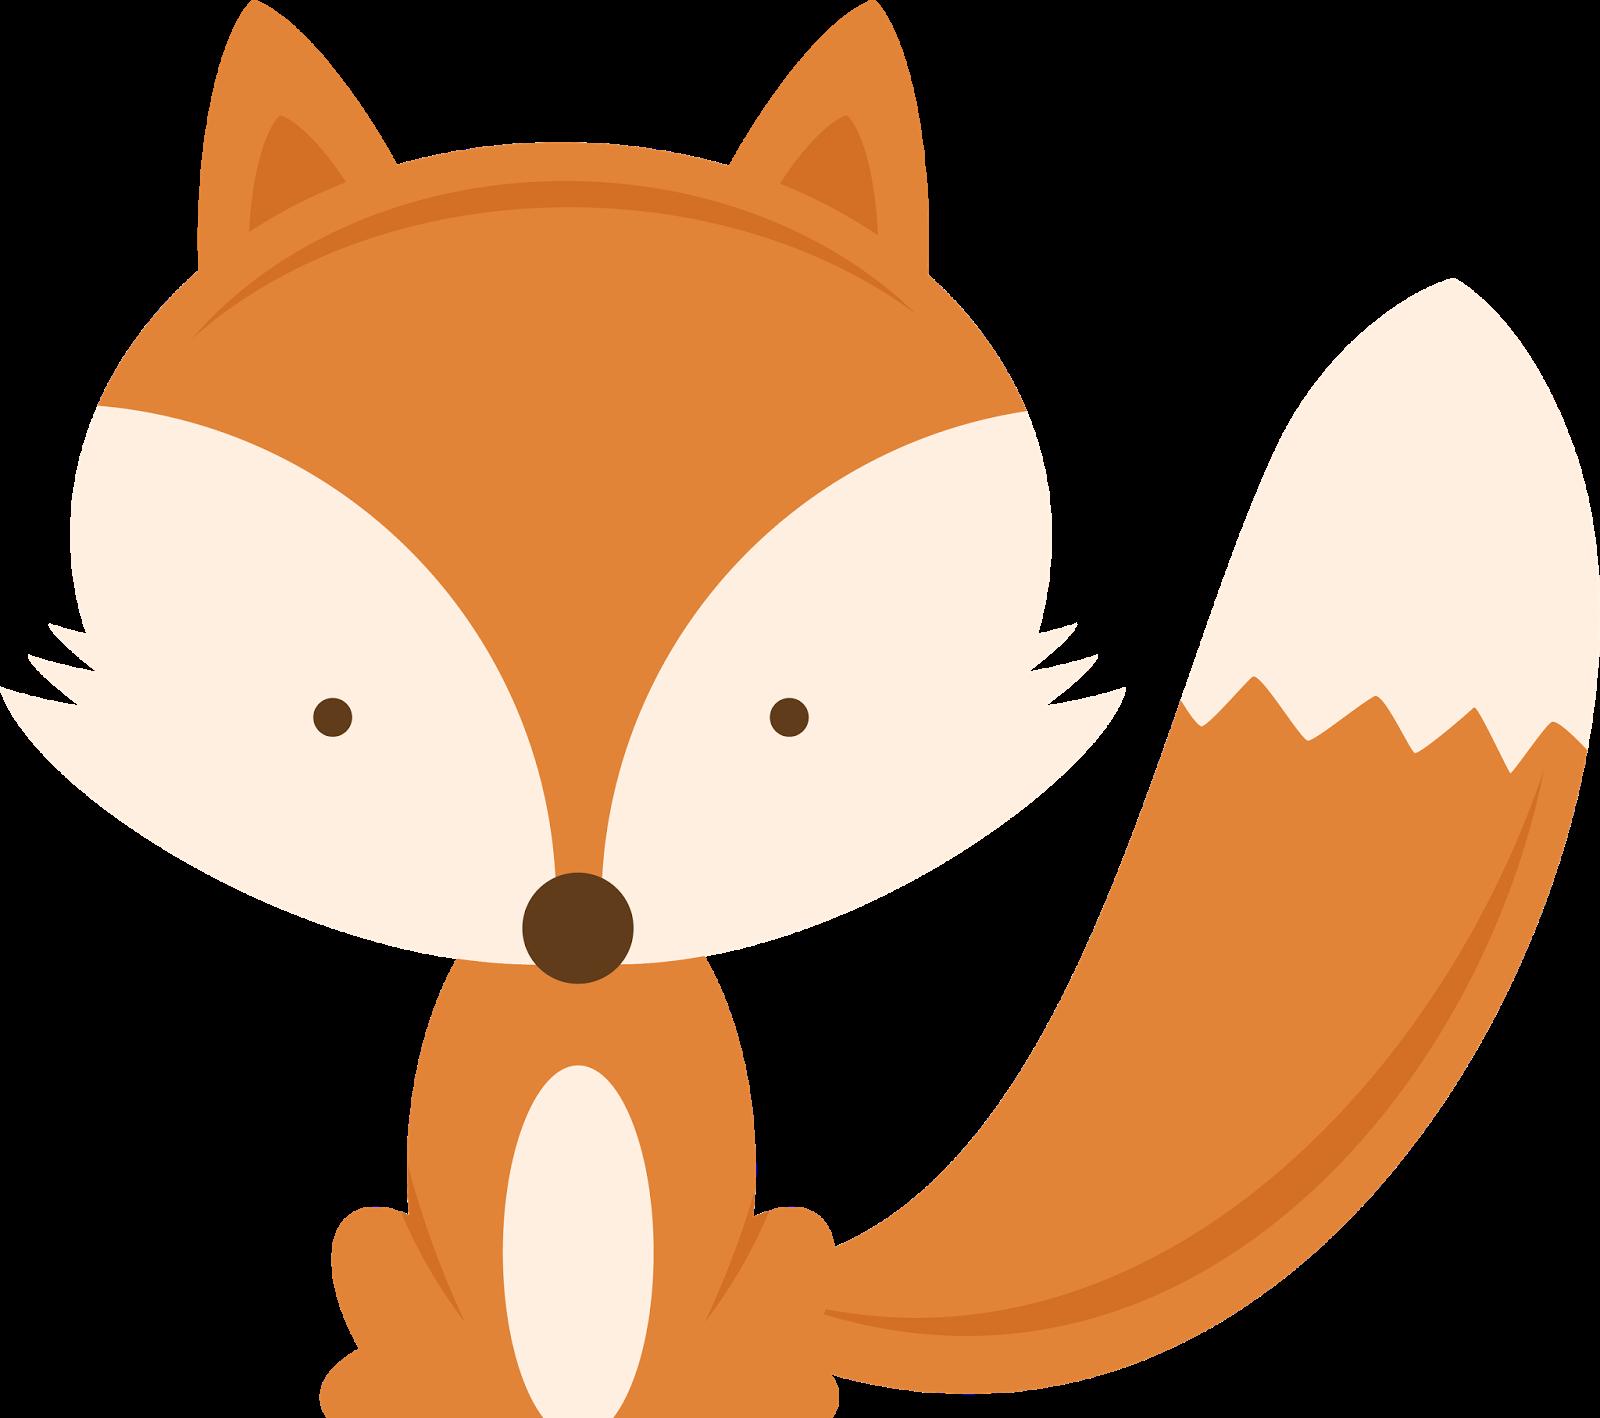 Fox clipart baby fox, Fox baby fox Transparent FREE for.